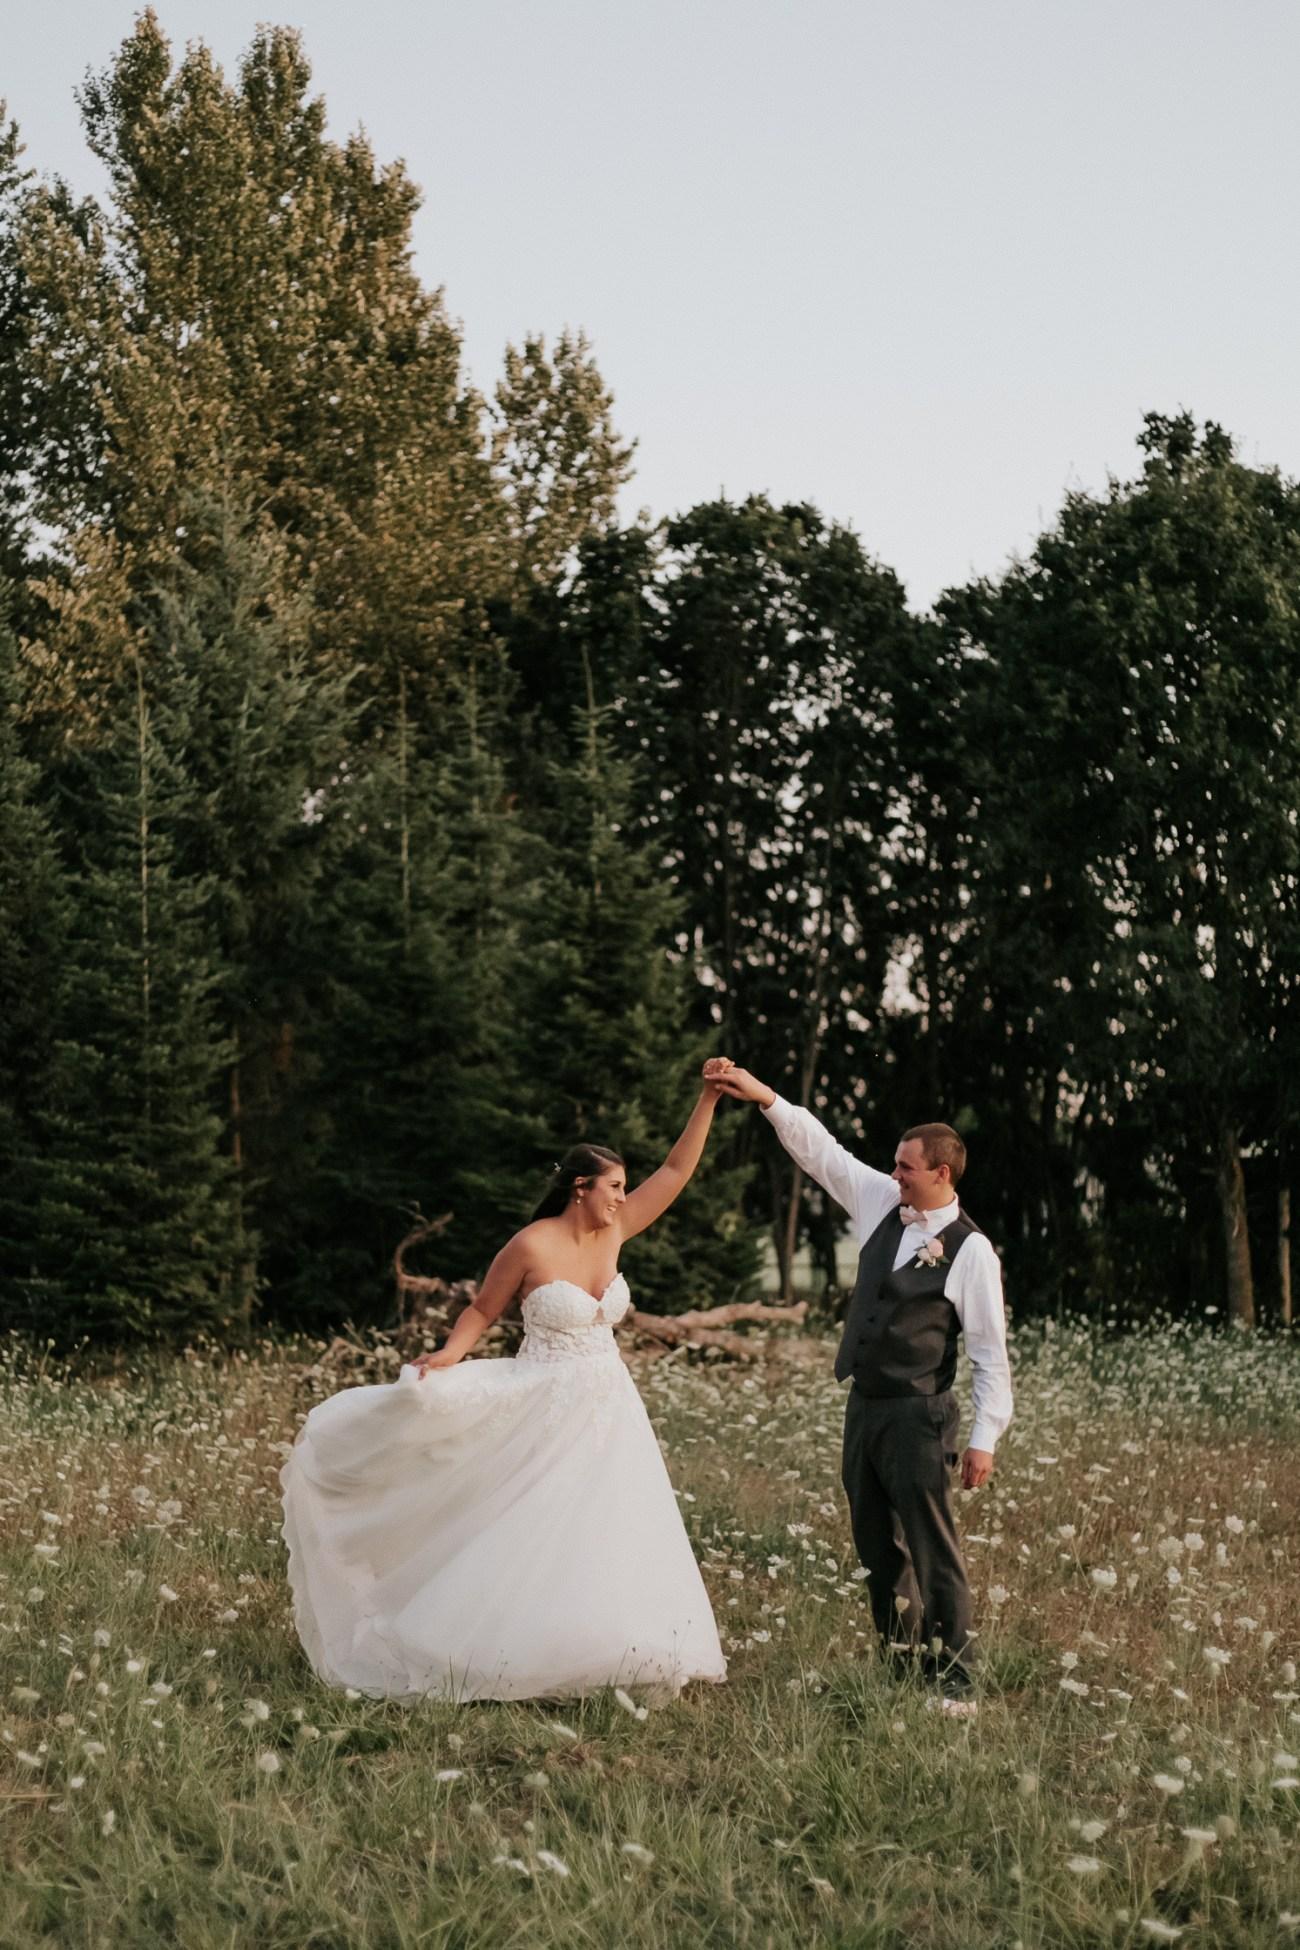 Megan Claire Photography | Arizona Wedding Photographer | Megan-Claire.com | Beautiful summer wedding in Portland, Oregon. Summer forest wedding inspiration.